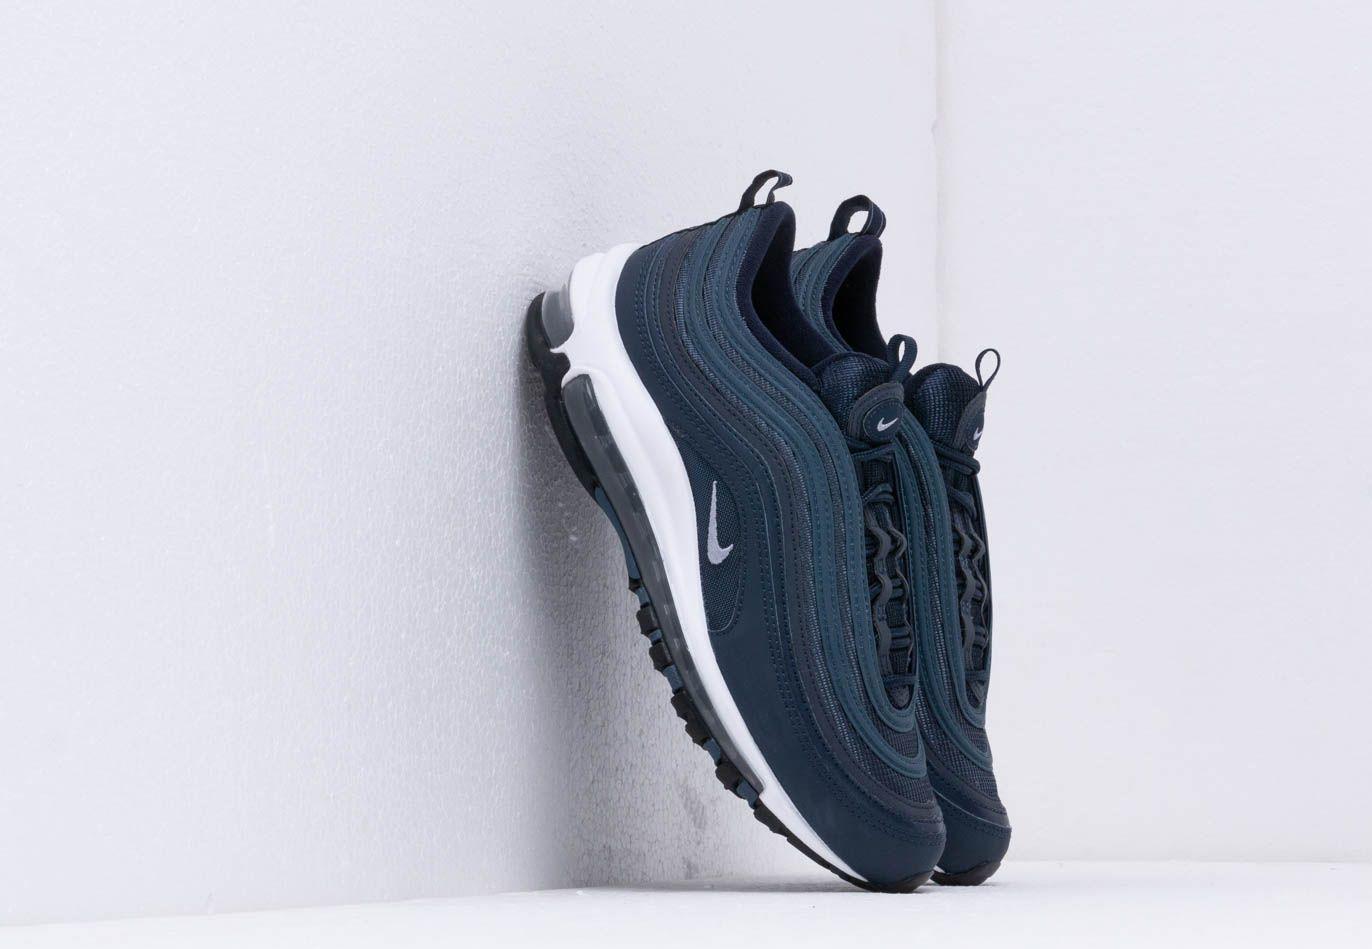 c20b299c83 Nike. Men's Air Max 97 Essential Obsidian/ Obsidian Mist-monsoon Blue